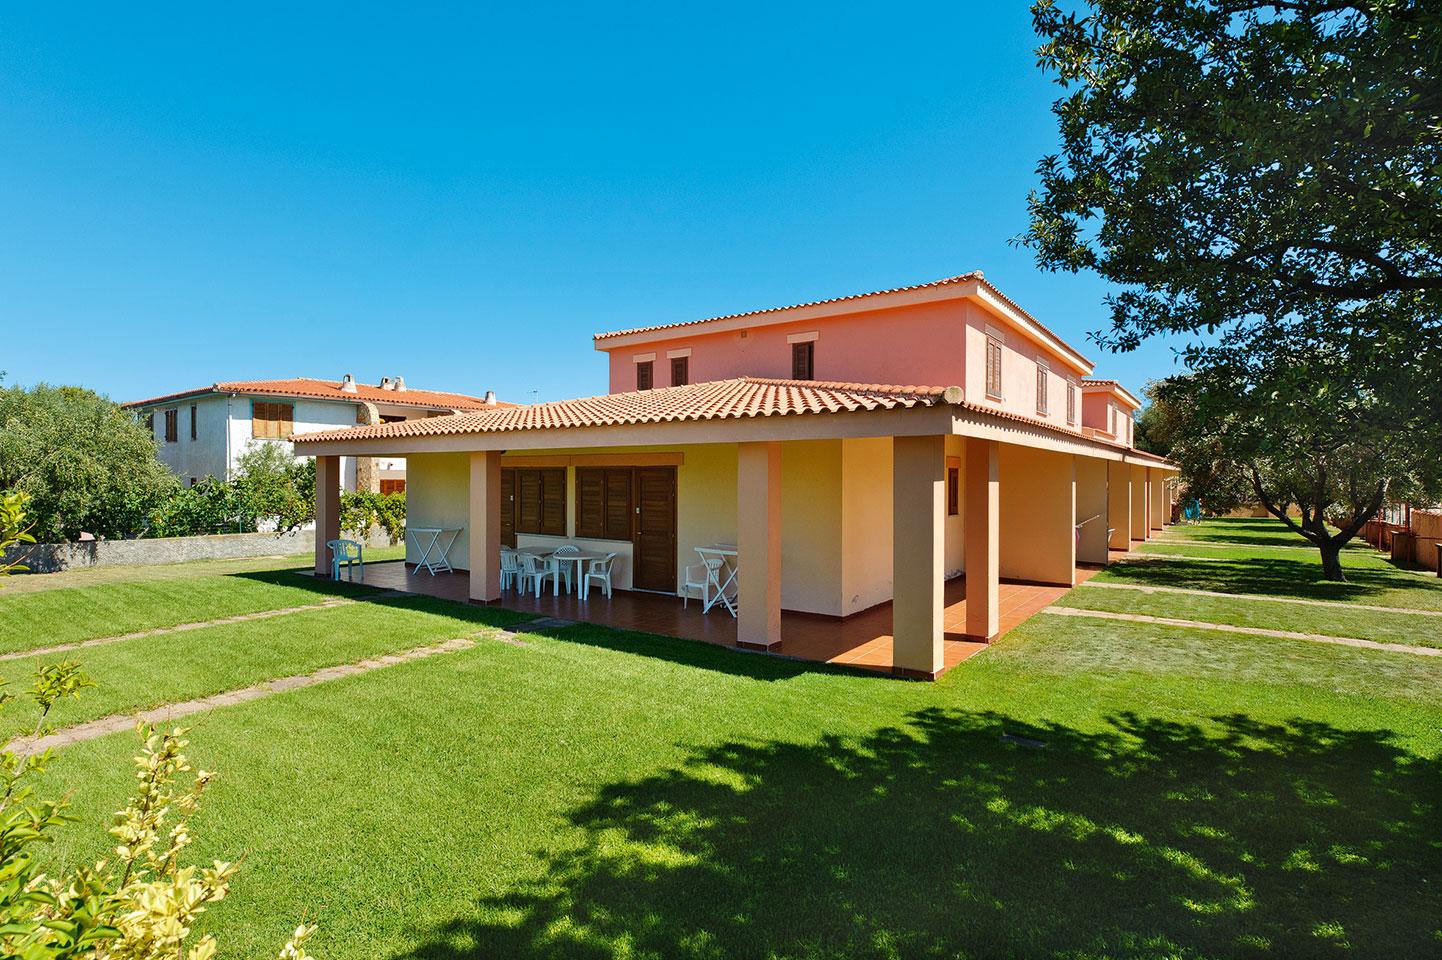 Residence Li Menduli - San Teodoro - Sardegna.com